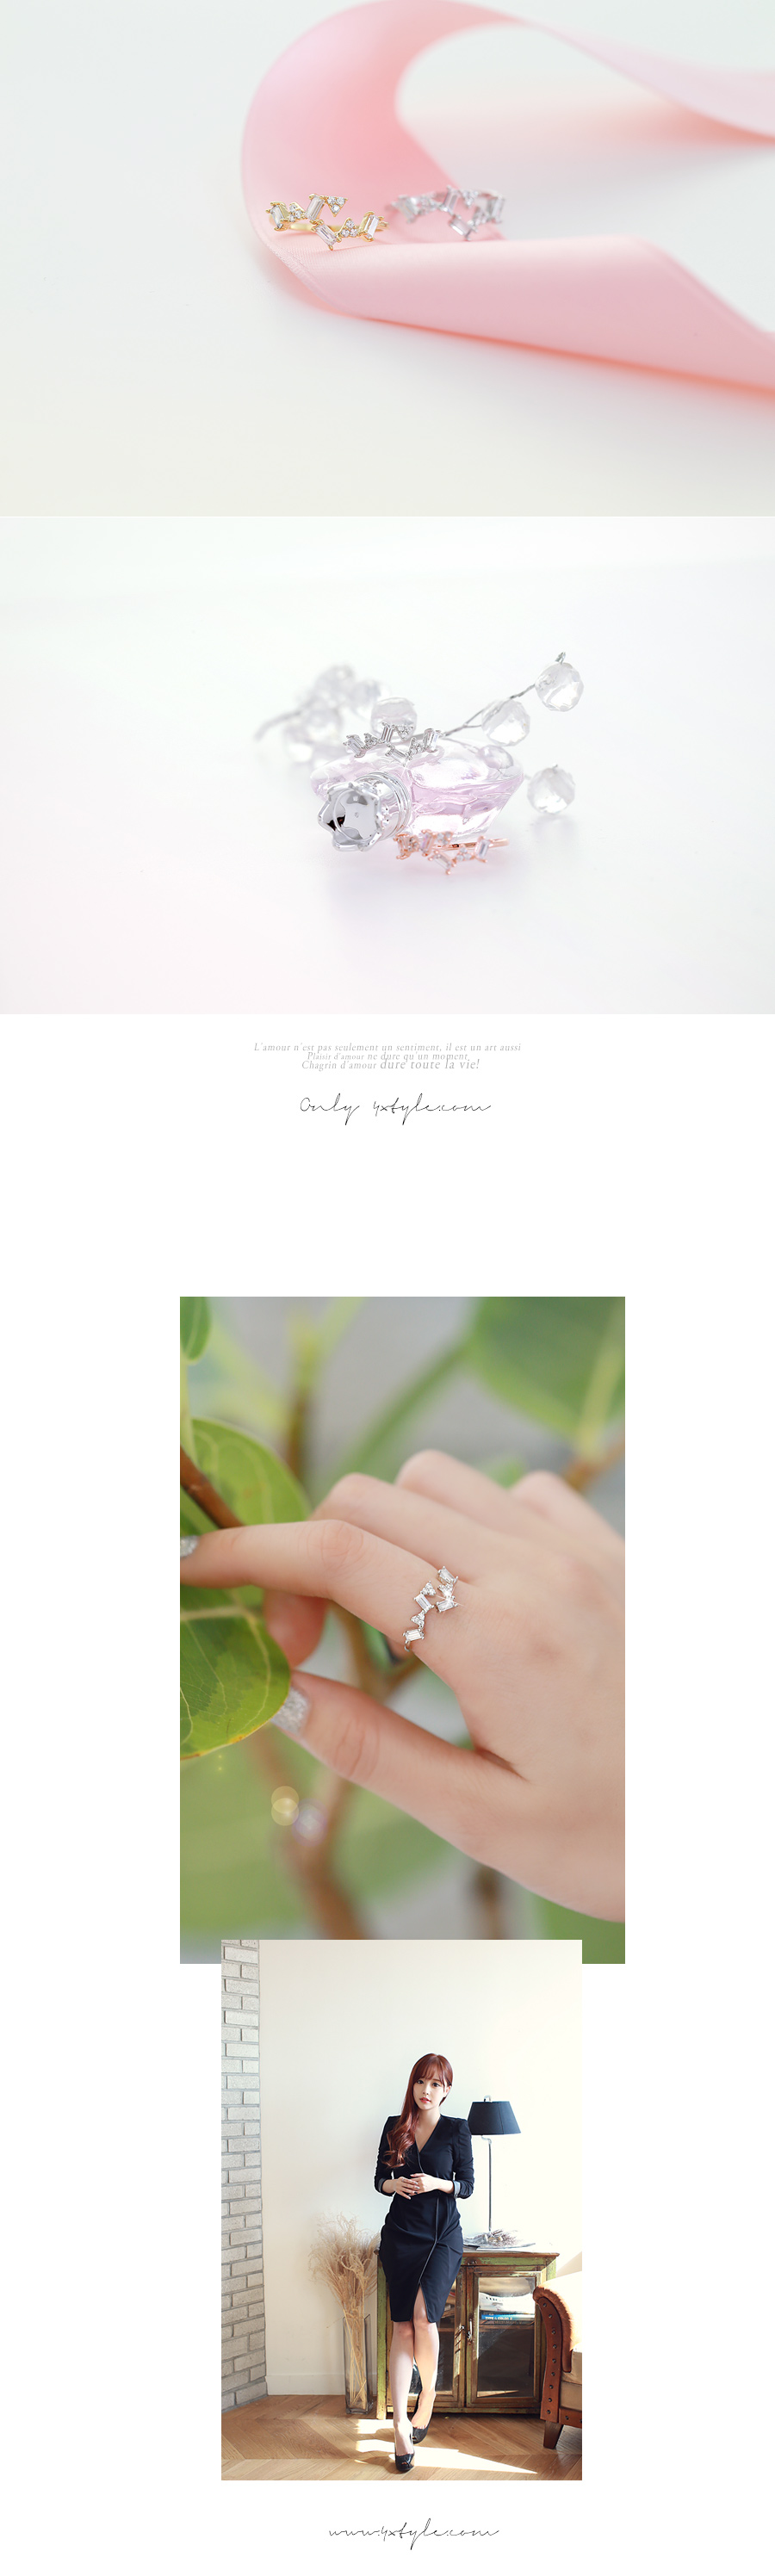 [ 4xtyle ] GENTLY CUBIC RING (WHITEGOLD)